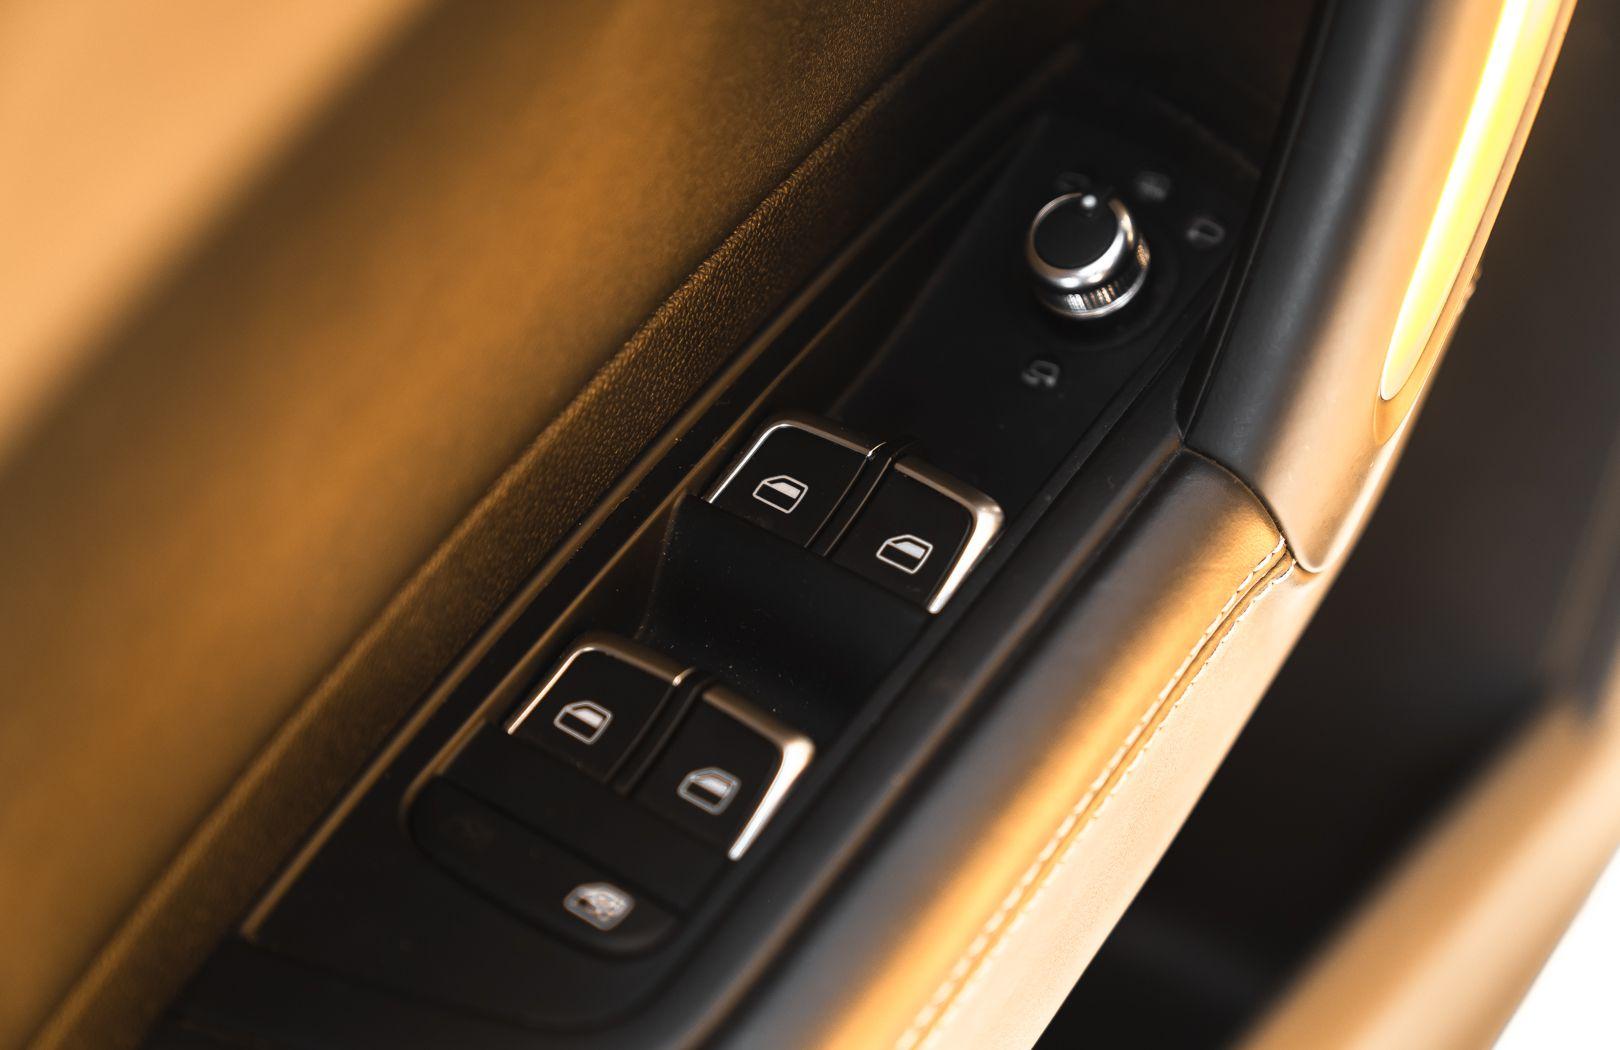 2014 Audi S1 Sportback 2.0 TFSI Quattro 83631